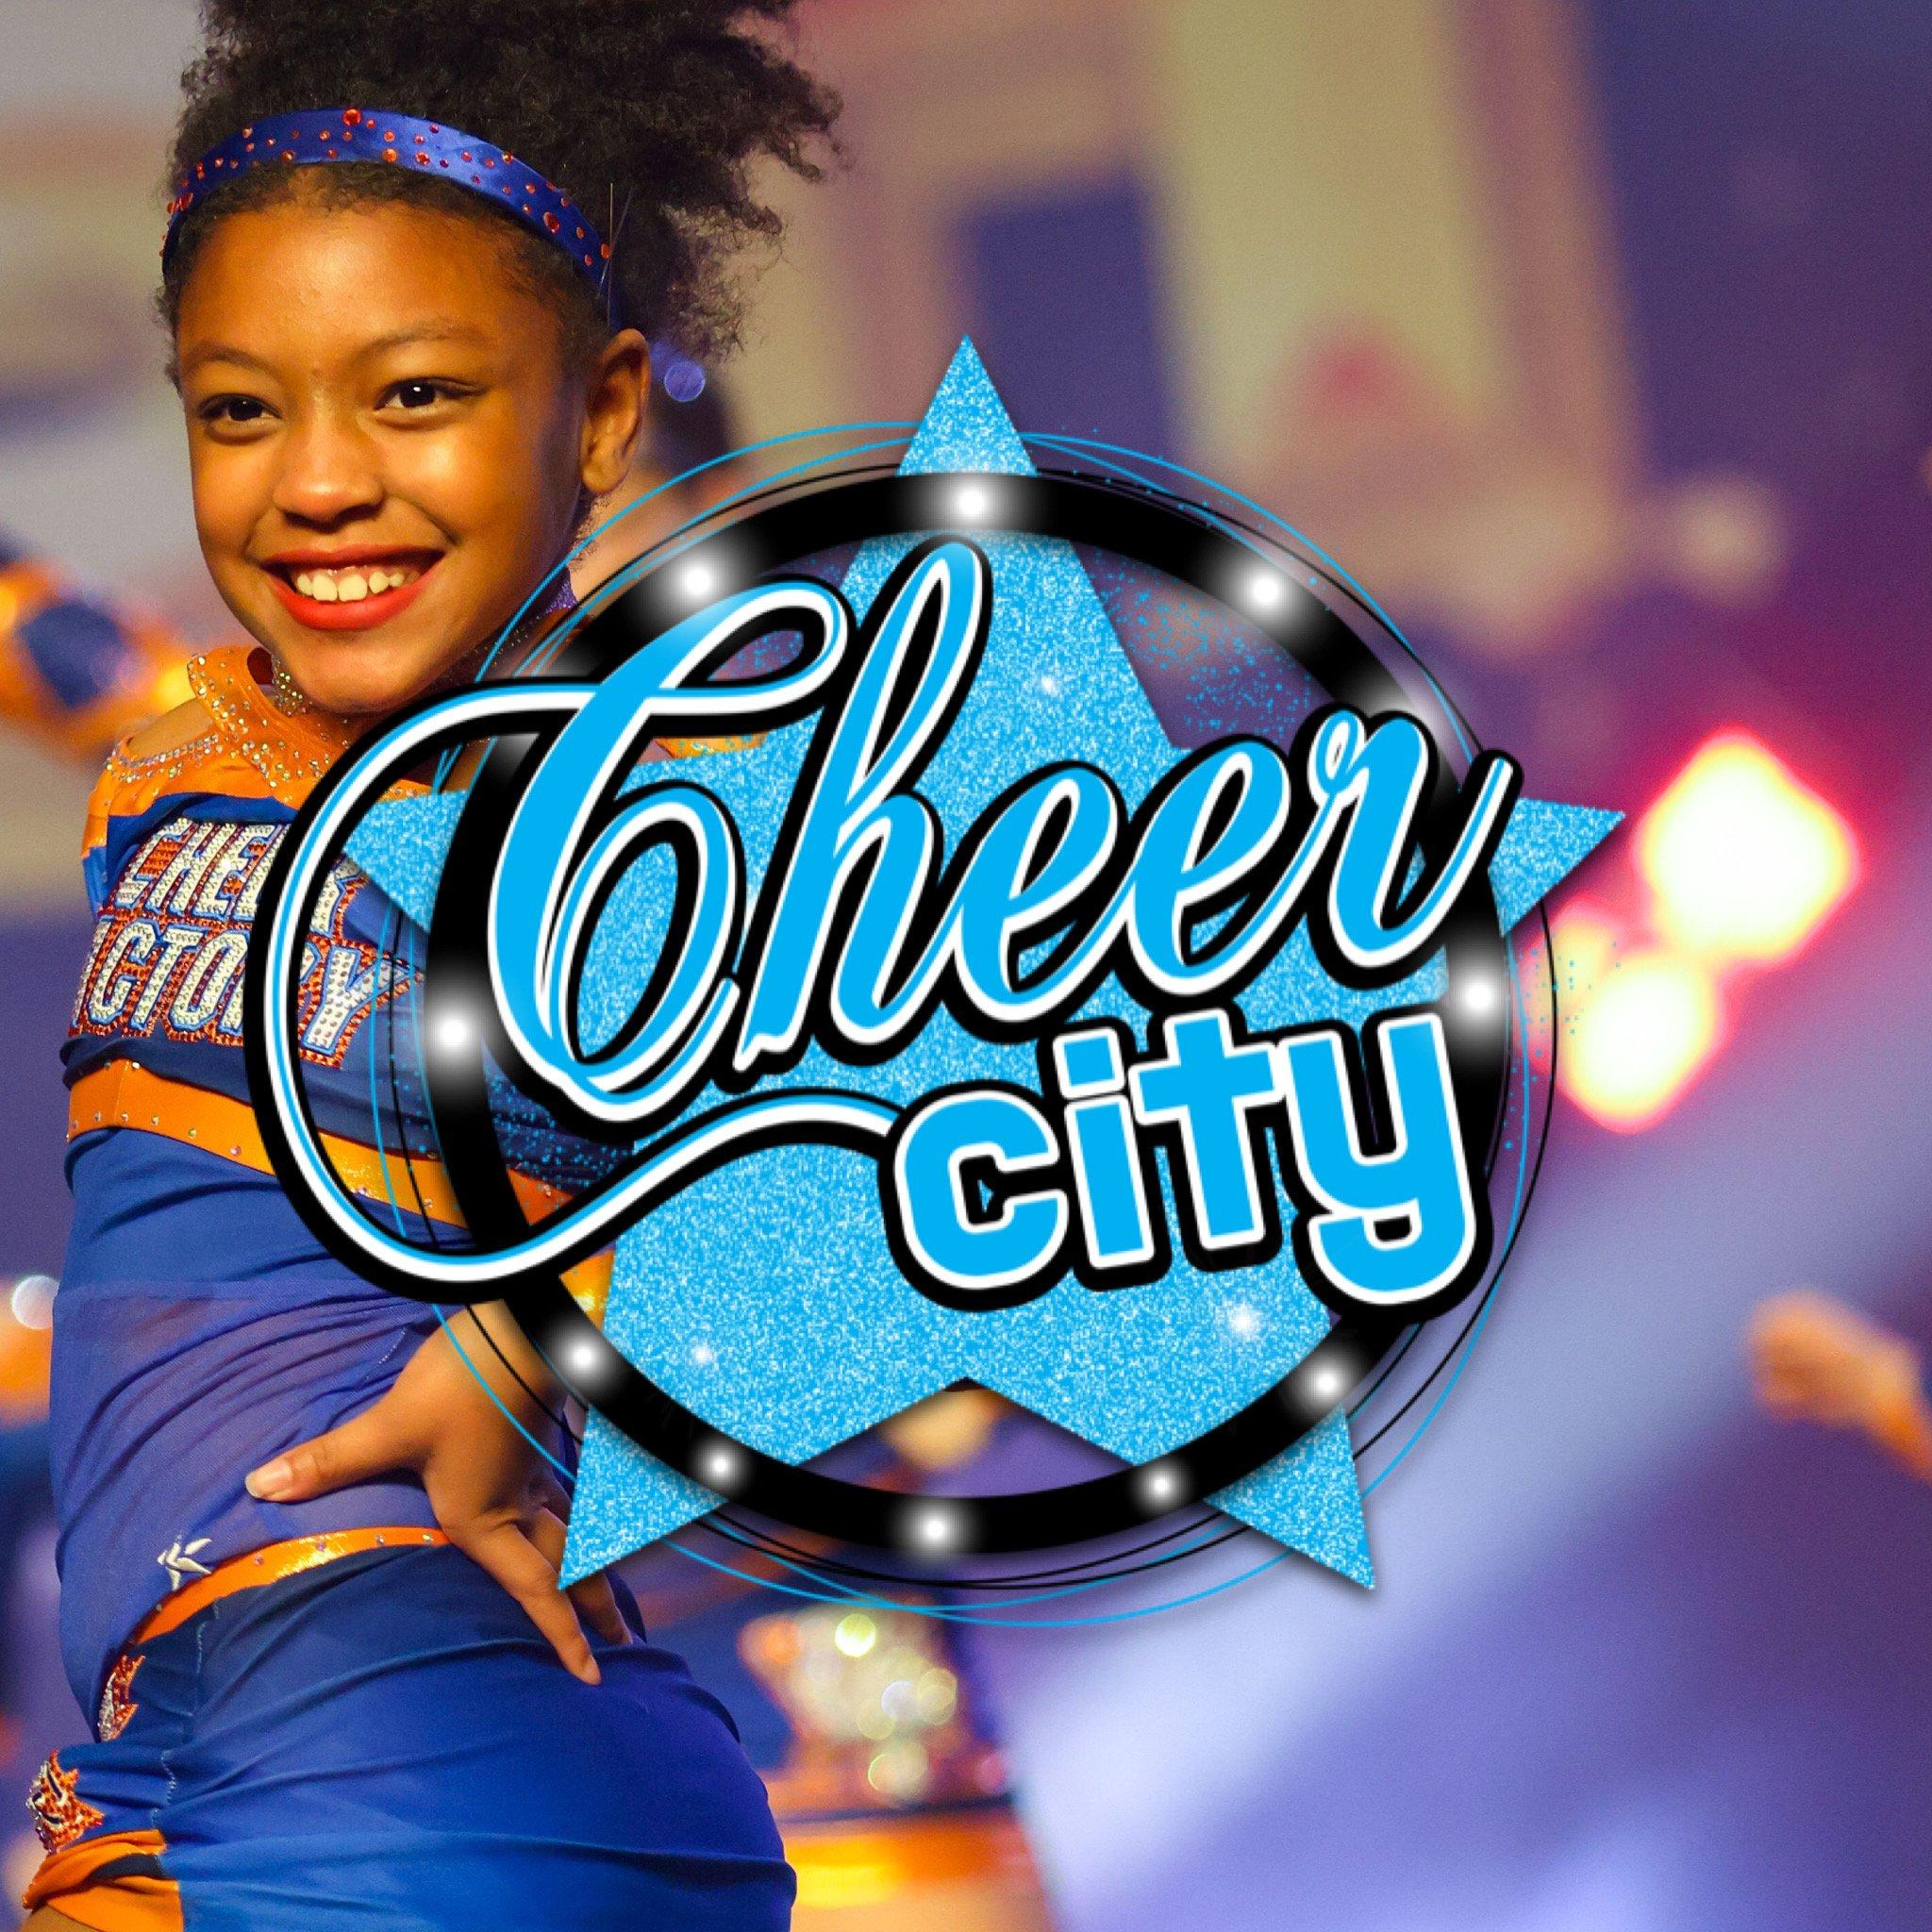 Cheer City Ltd